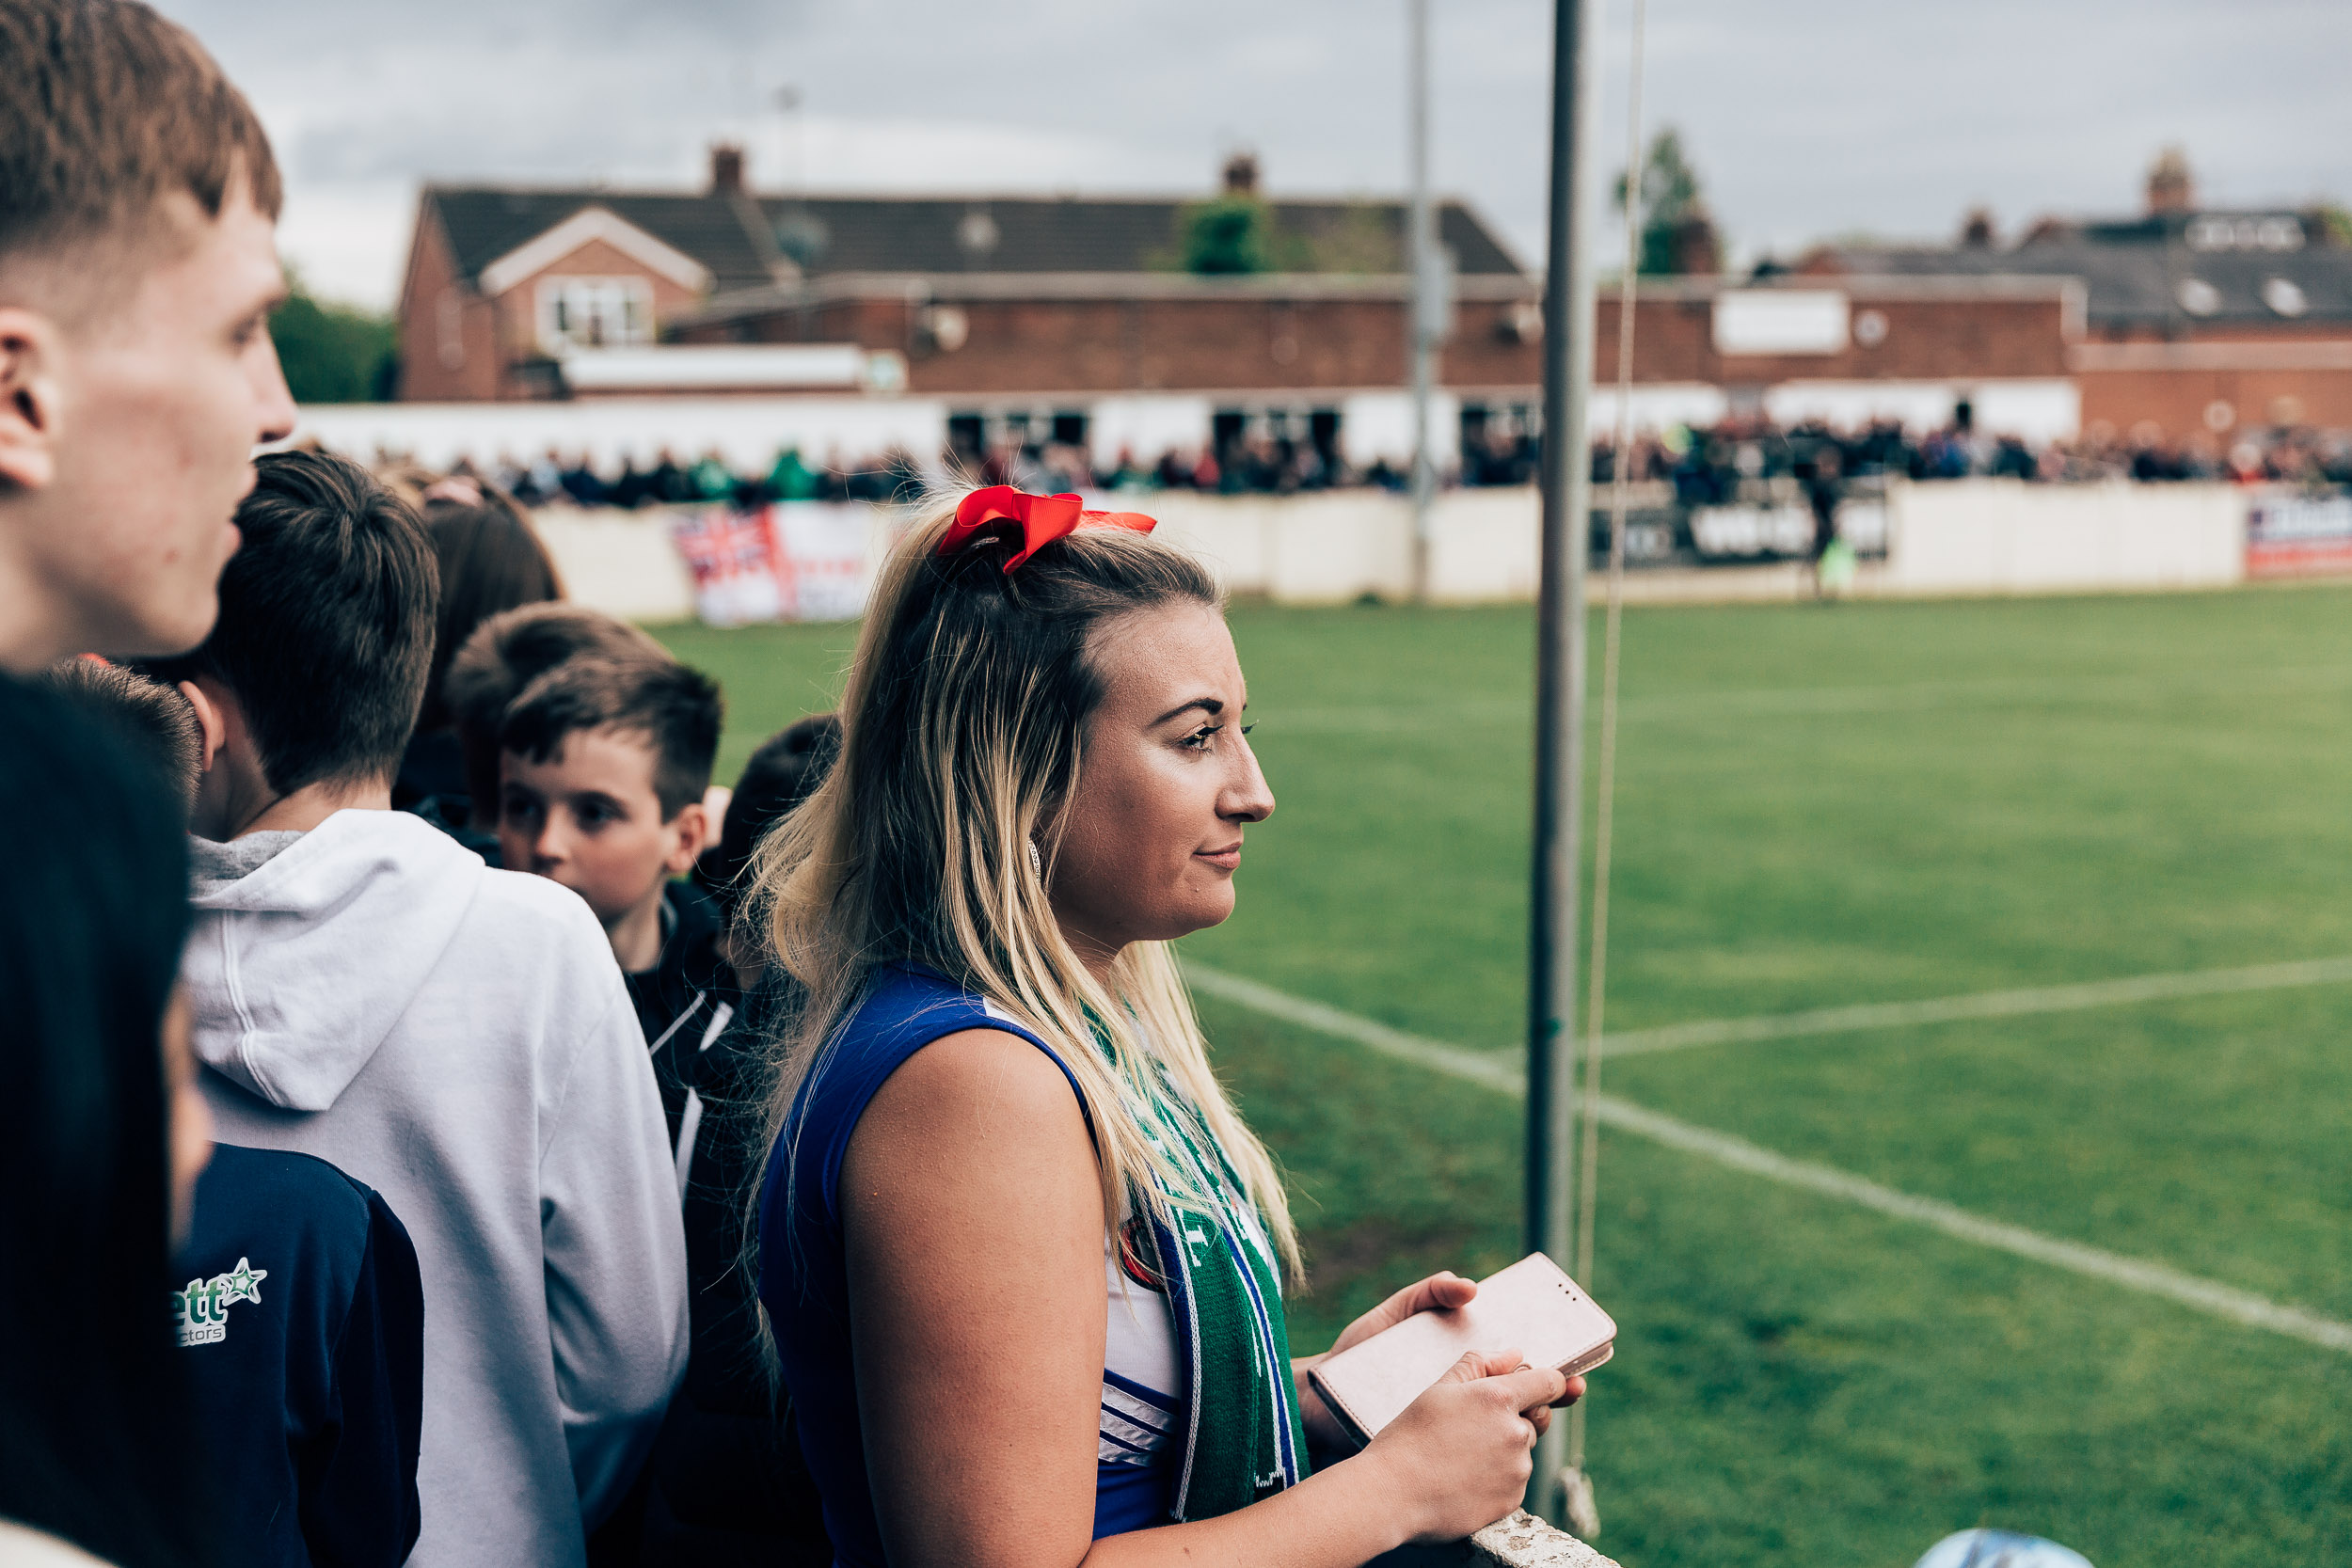 06_05_2019_Bromsgrove_Sporting_Corby-73.jpg